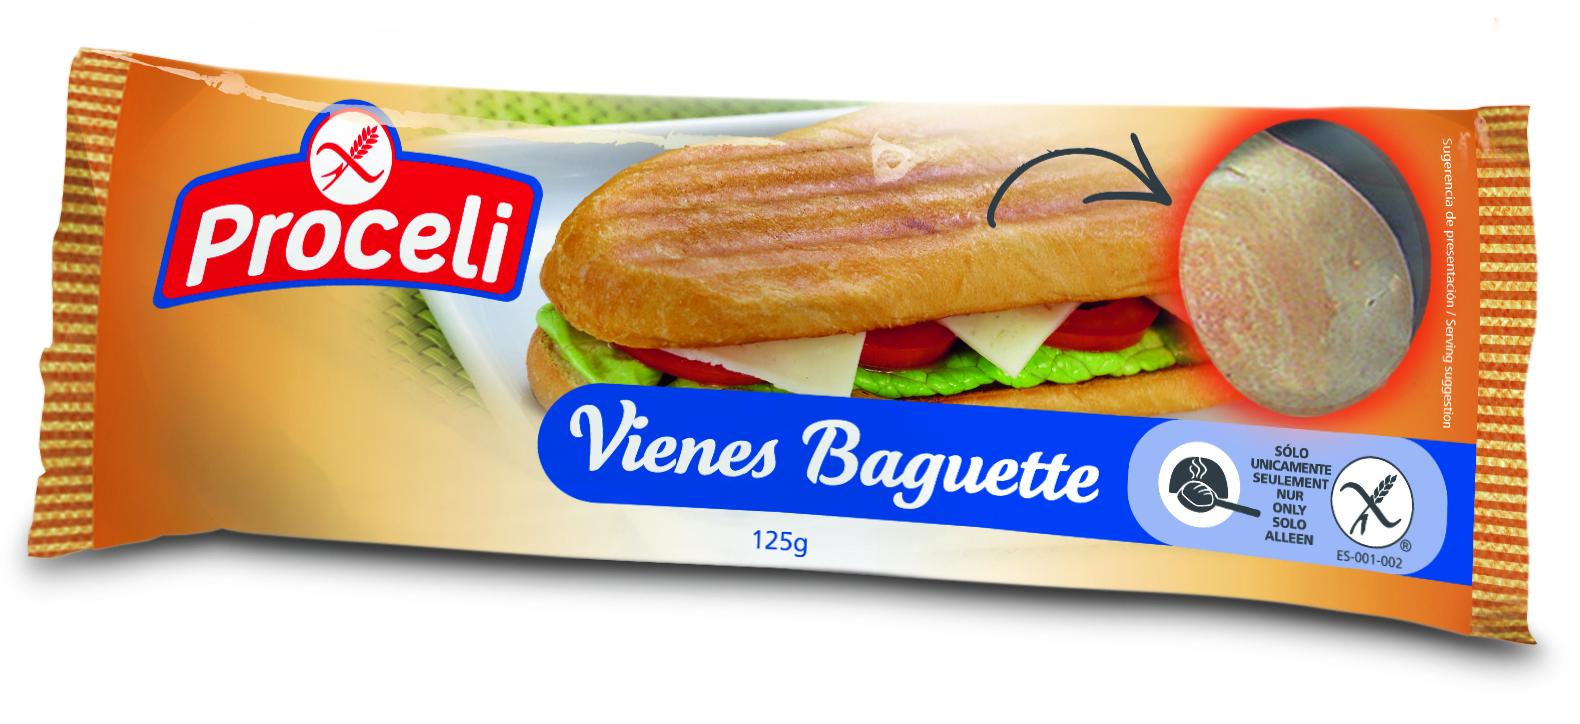 Viene Baguette de Proceli sin gluten